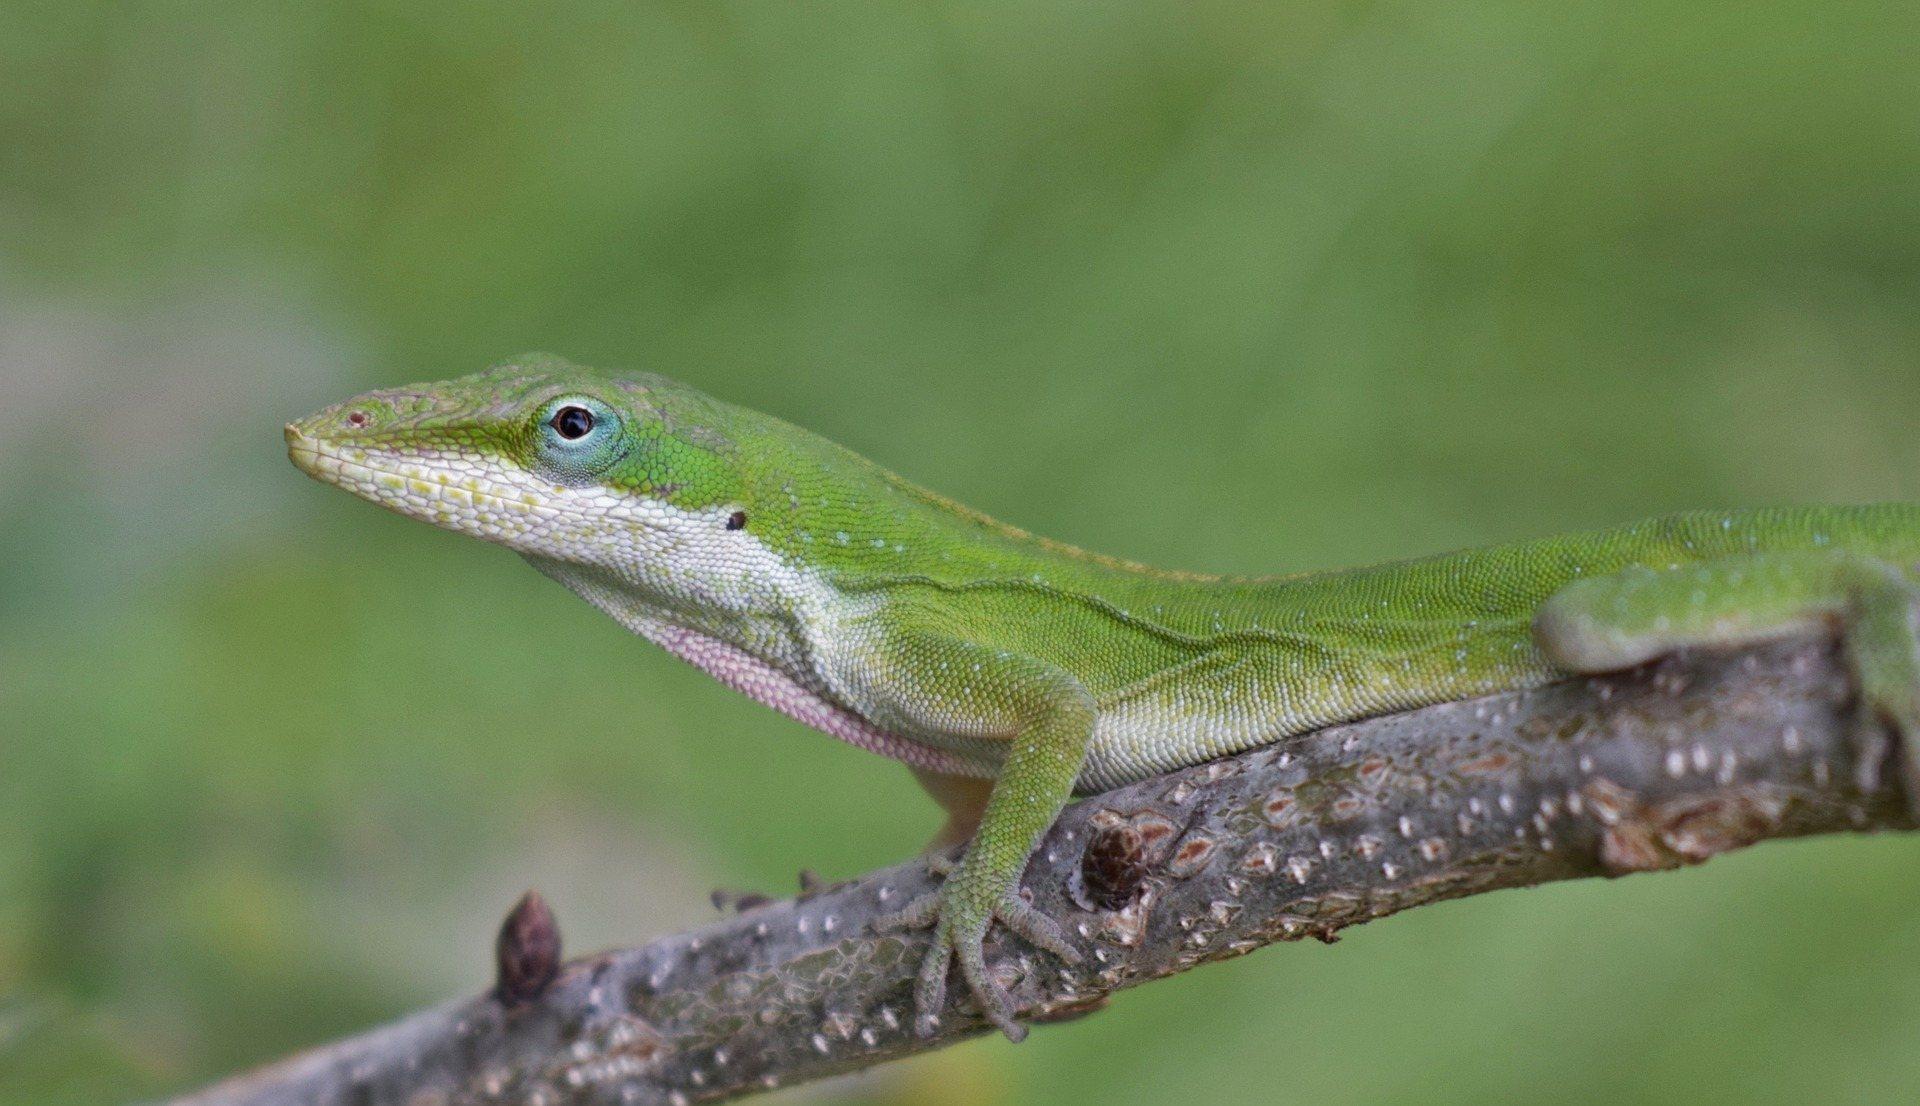 green anole lizard habitat